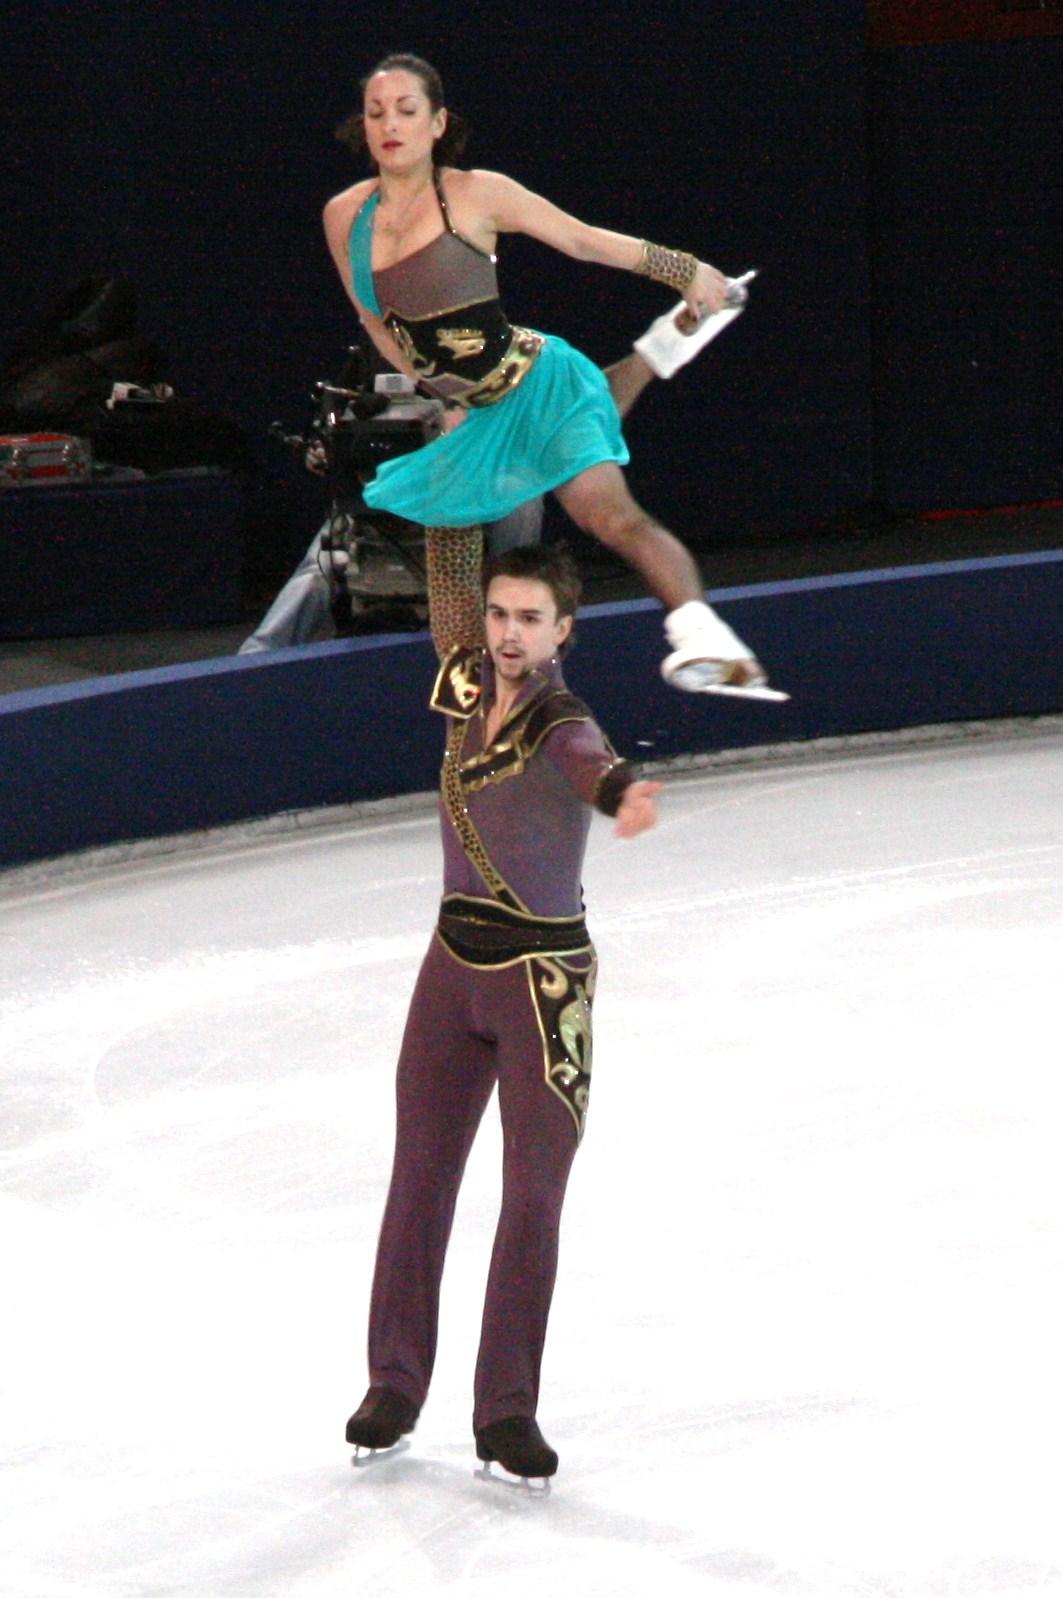 fedor klimov and ksenia stolbova dating divas